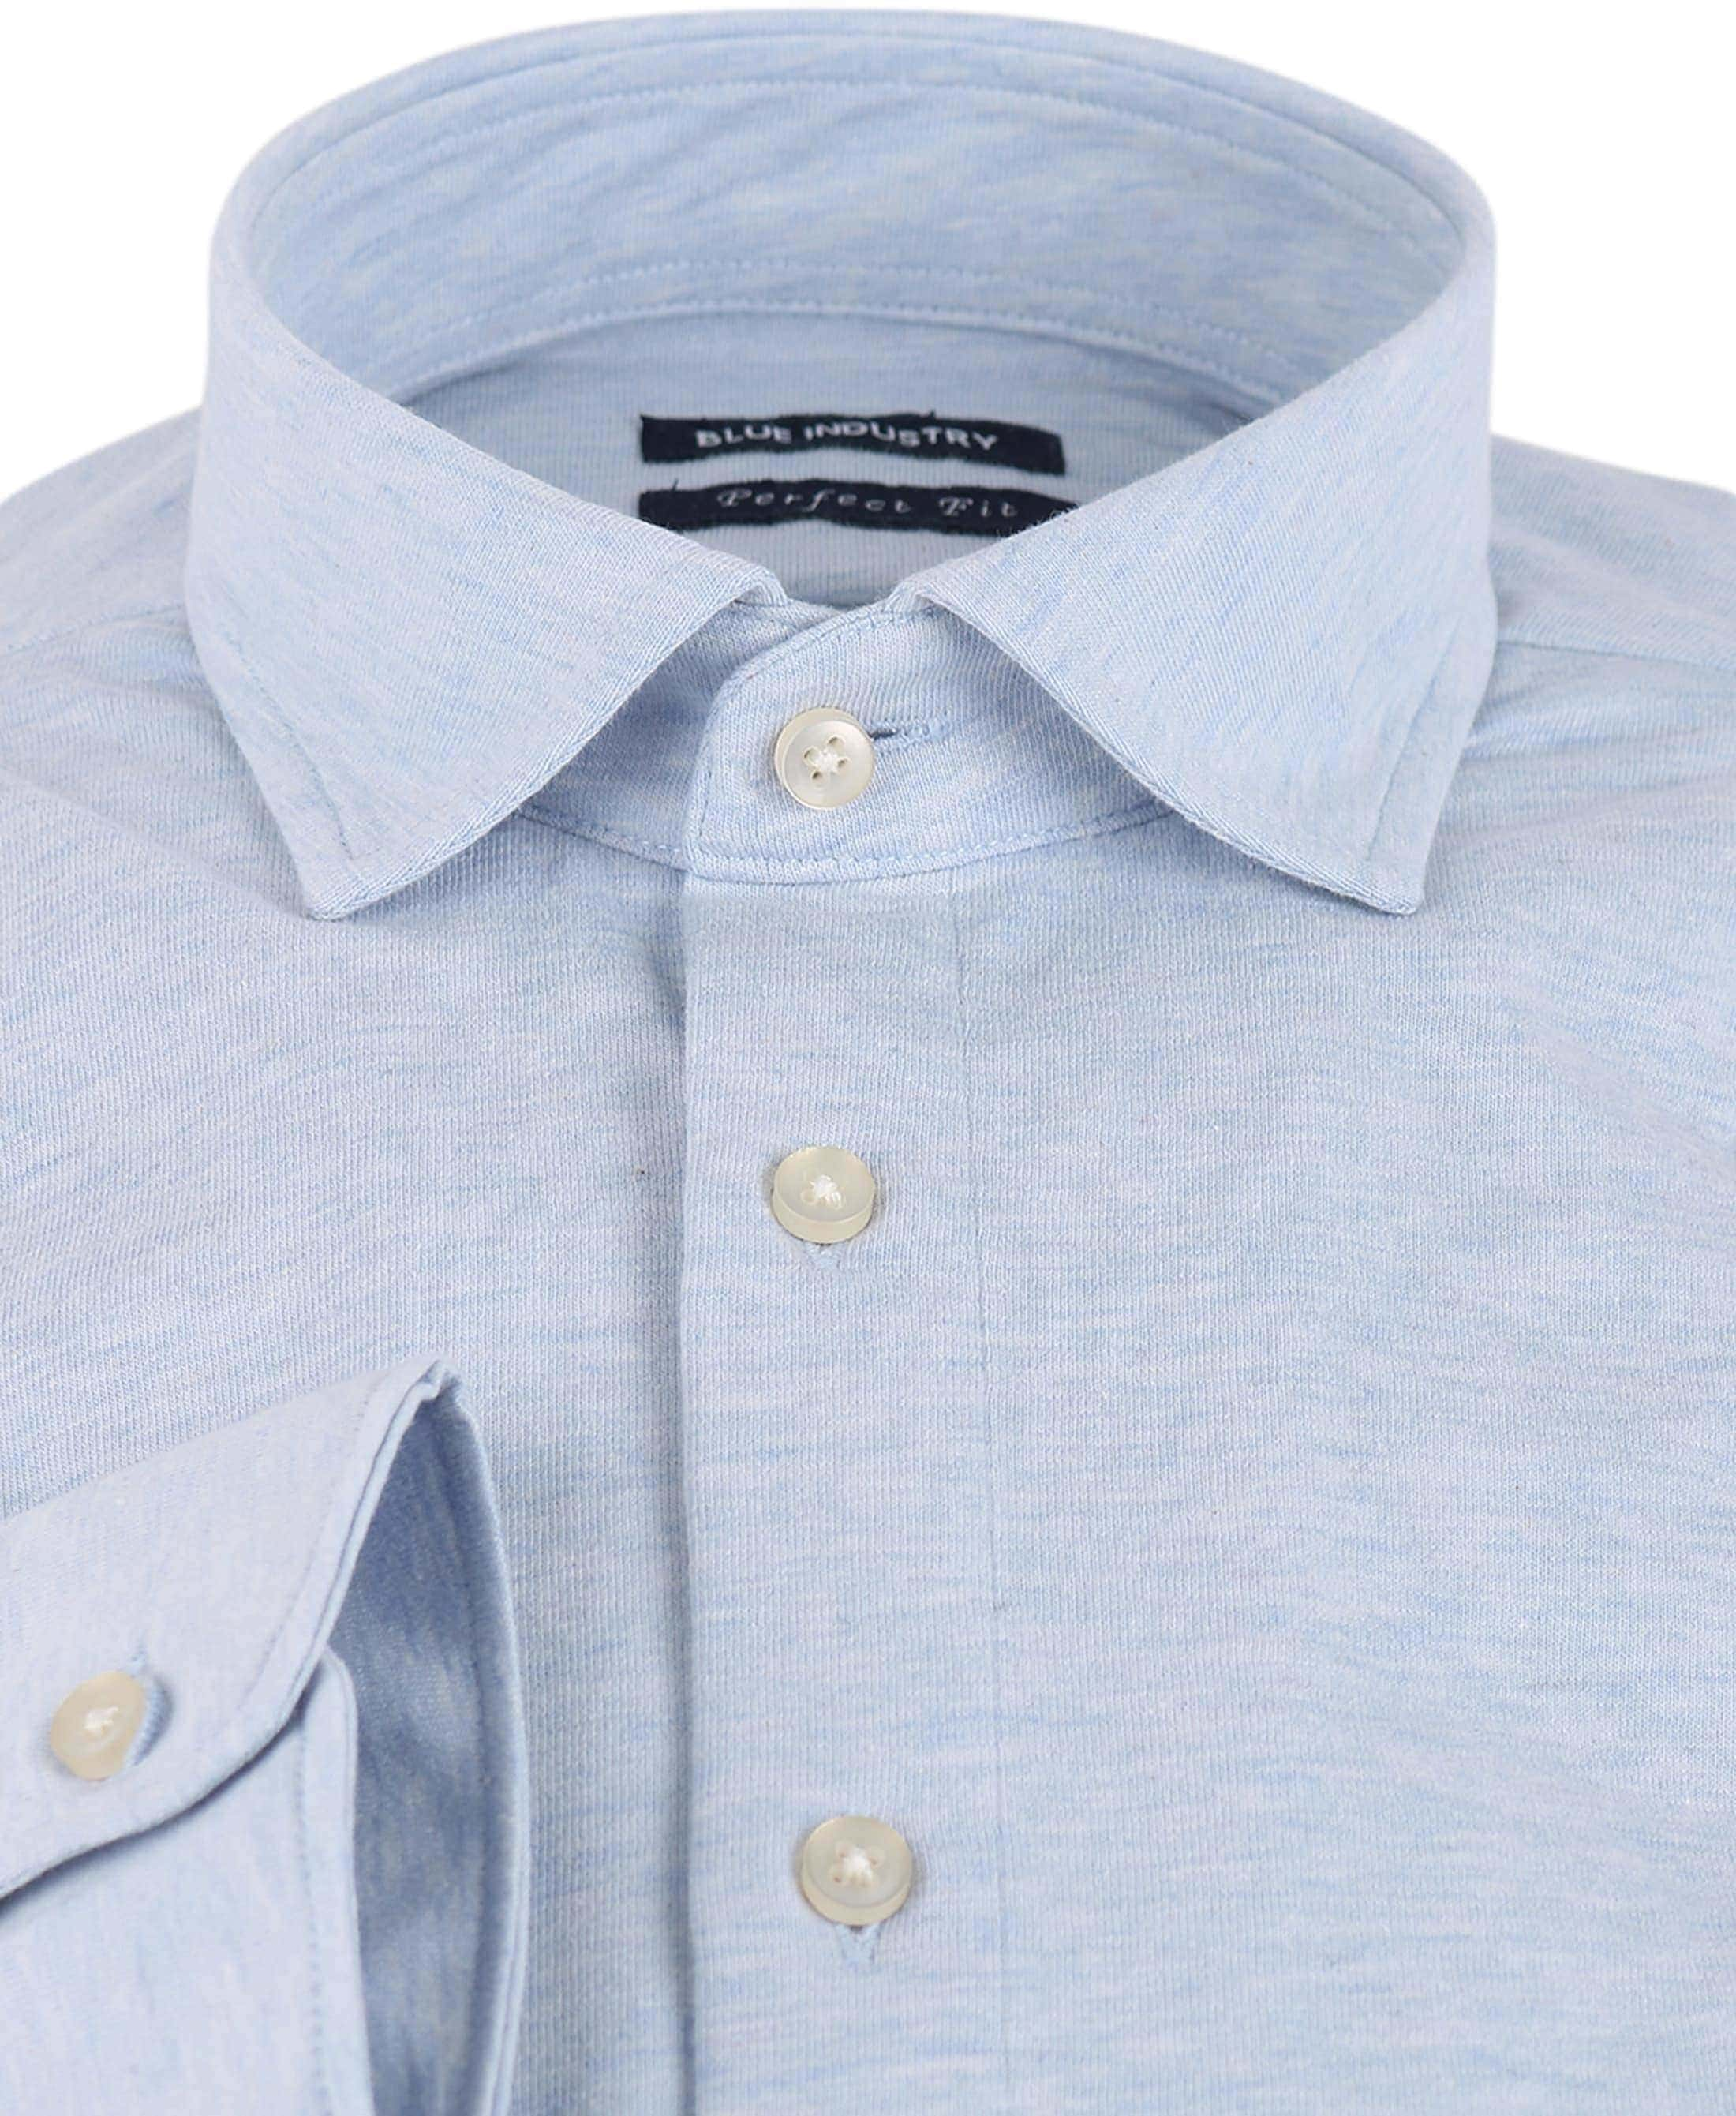 Blue Industry Overhemd Stretch Blauw foto 1